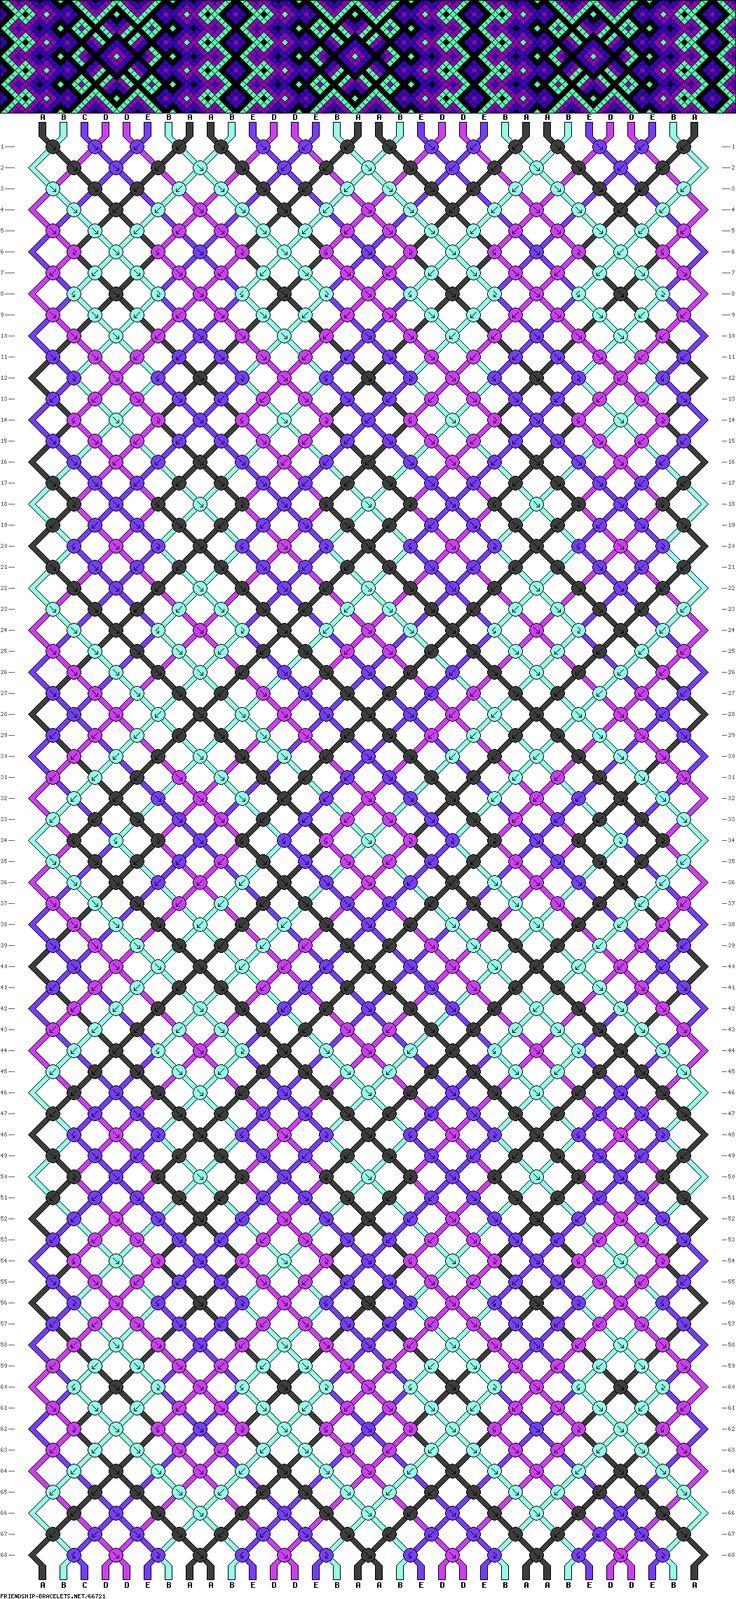 32 strings, 68 rows, 5 colors